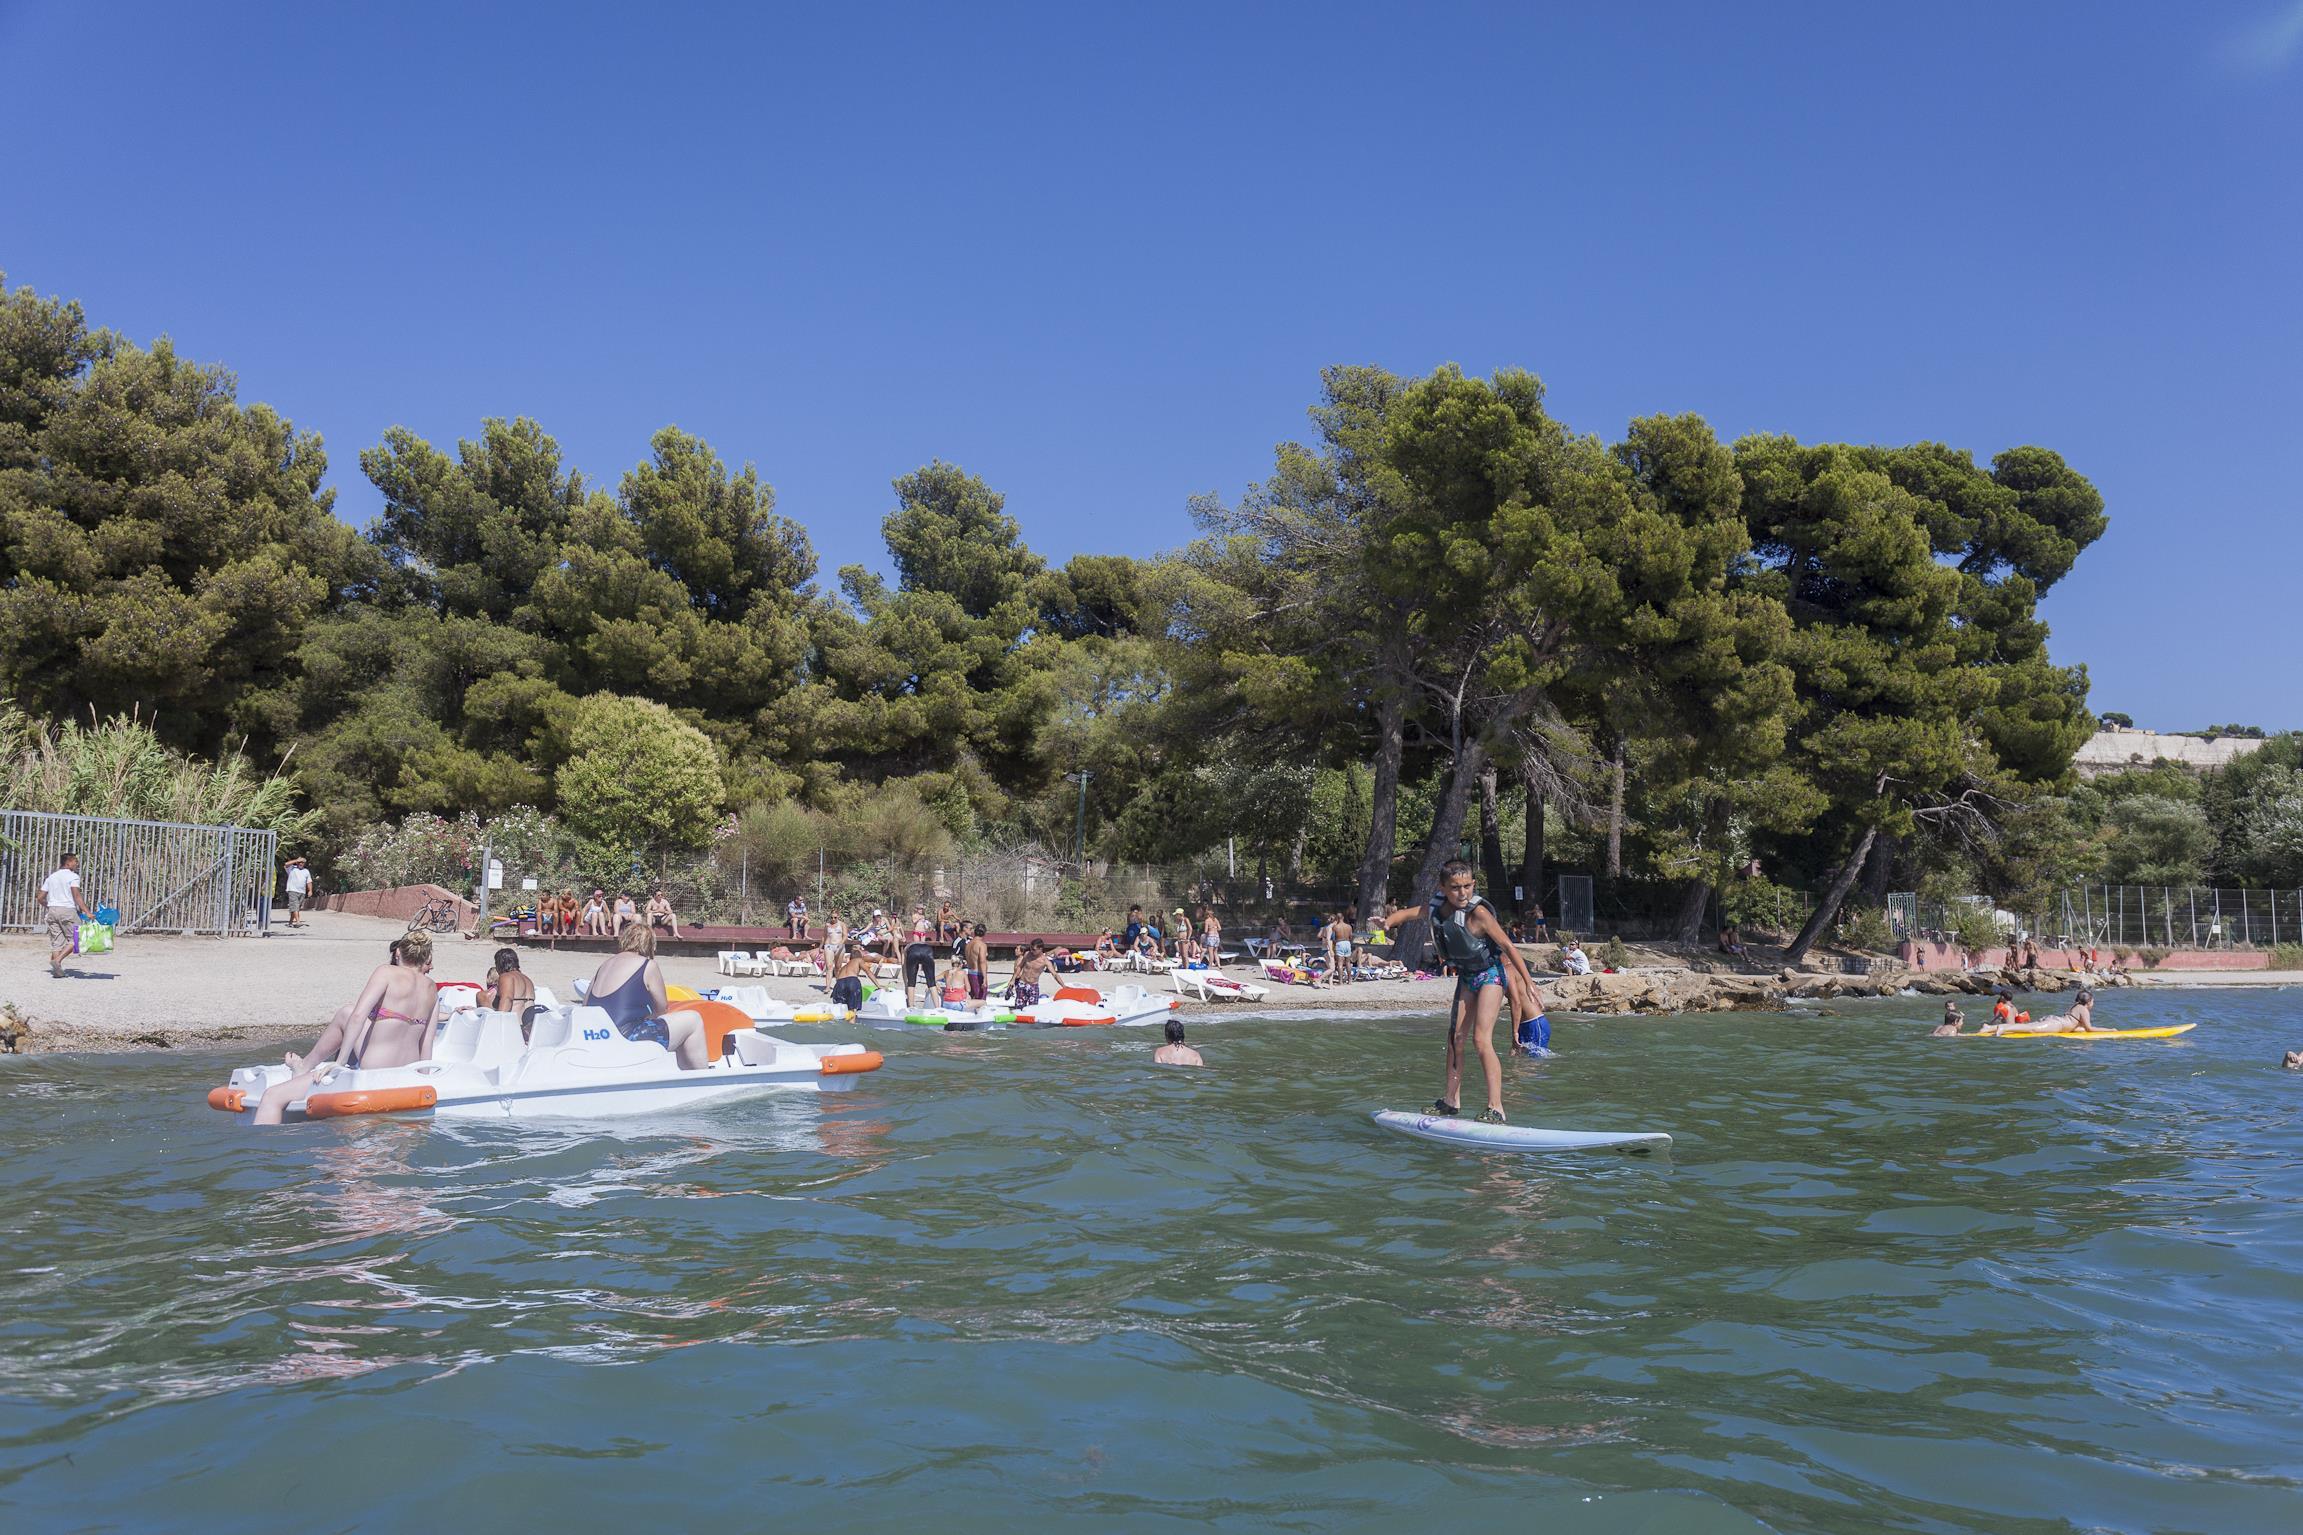 Camping Marina Plage, Vitrolles, Bouches-du-Rhône